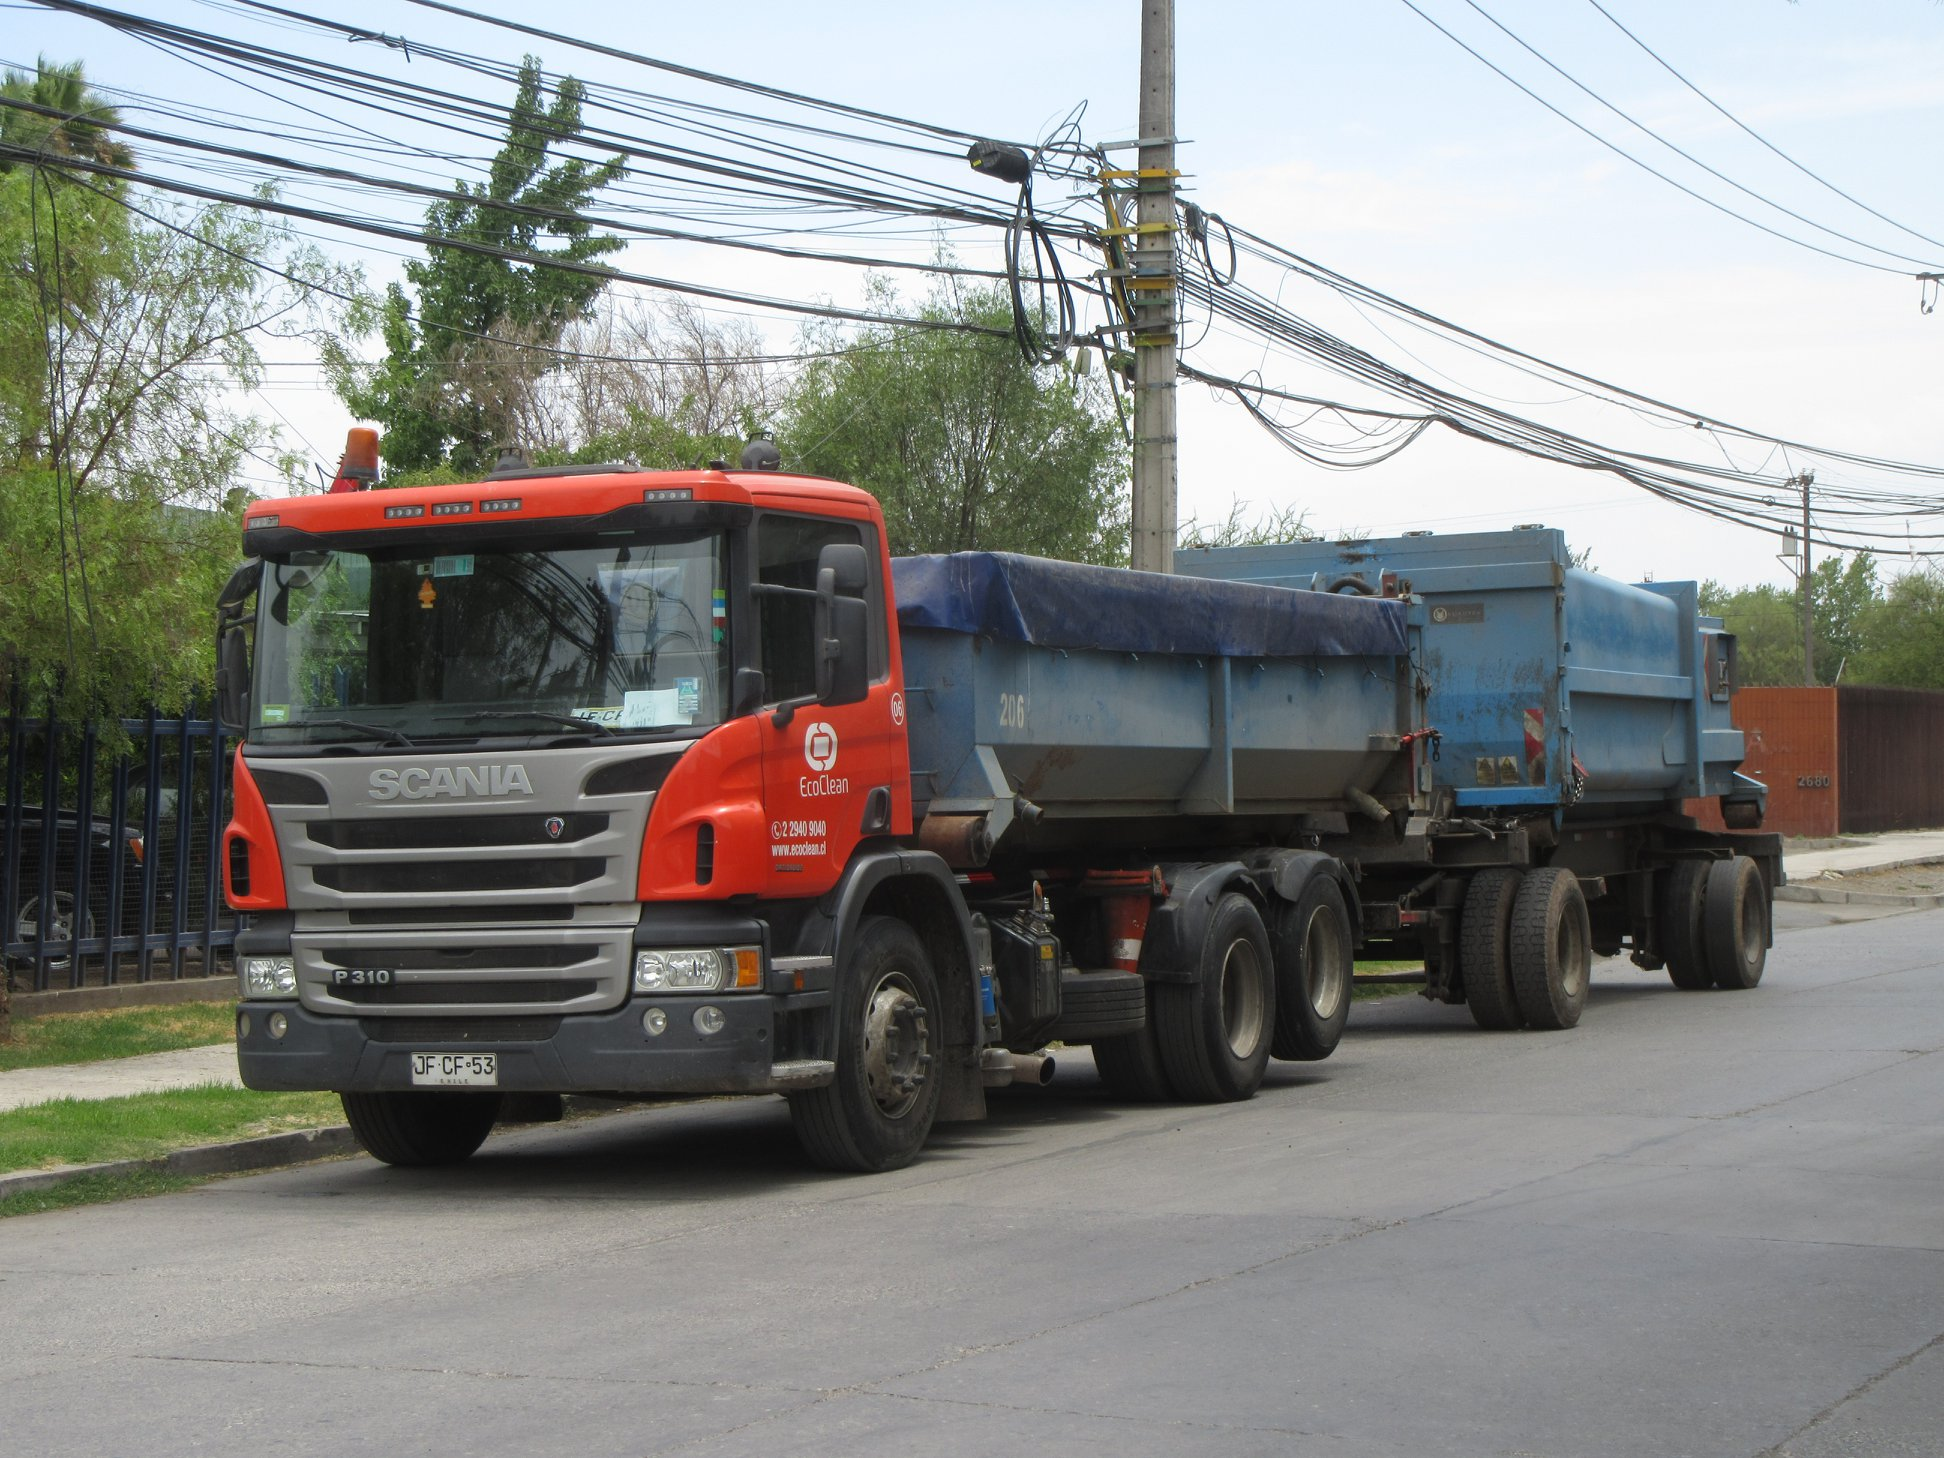 SCANIA-P-310-B-OPTICRUISE-6X2-CAMION-AMPLI-ROLL-No-06--2017-eco-clean